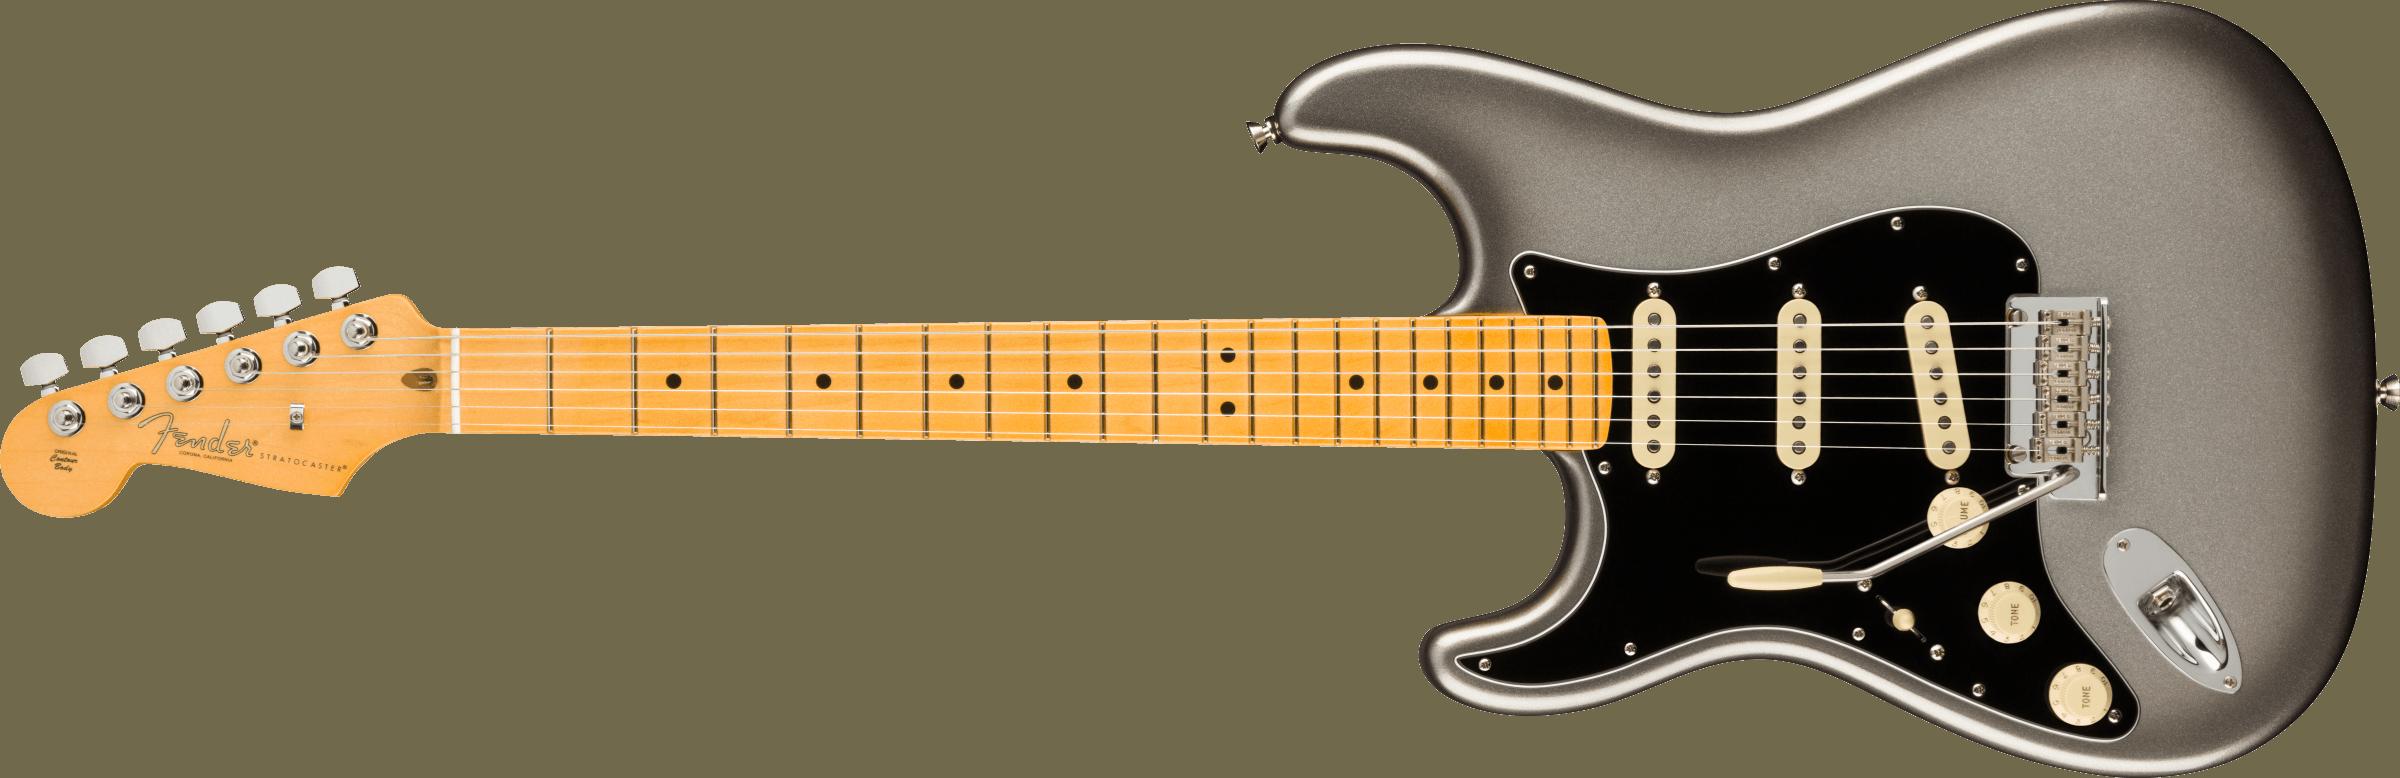 FENDER-American-Professional-II-Stratocaster-Left-Hand-Maple-Fingerboard-Mercury-sku-571005543